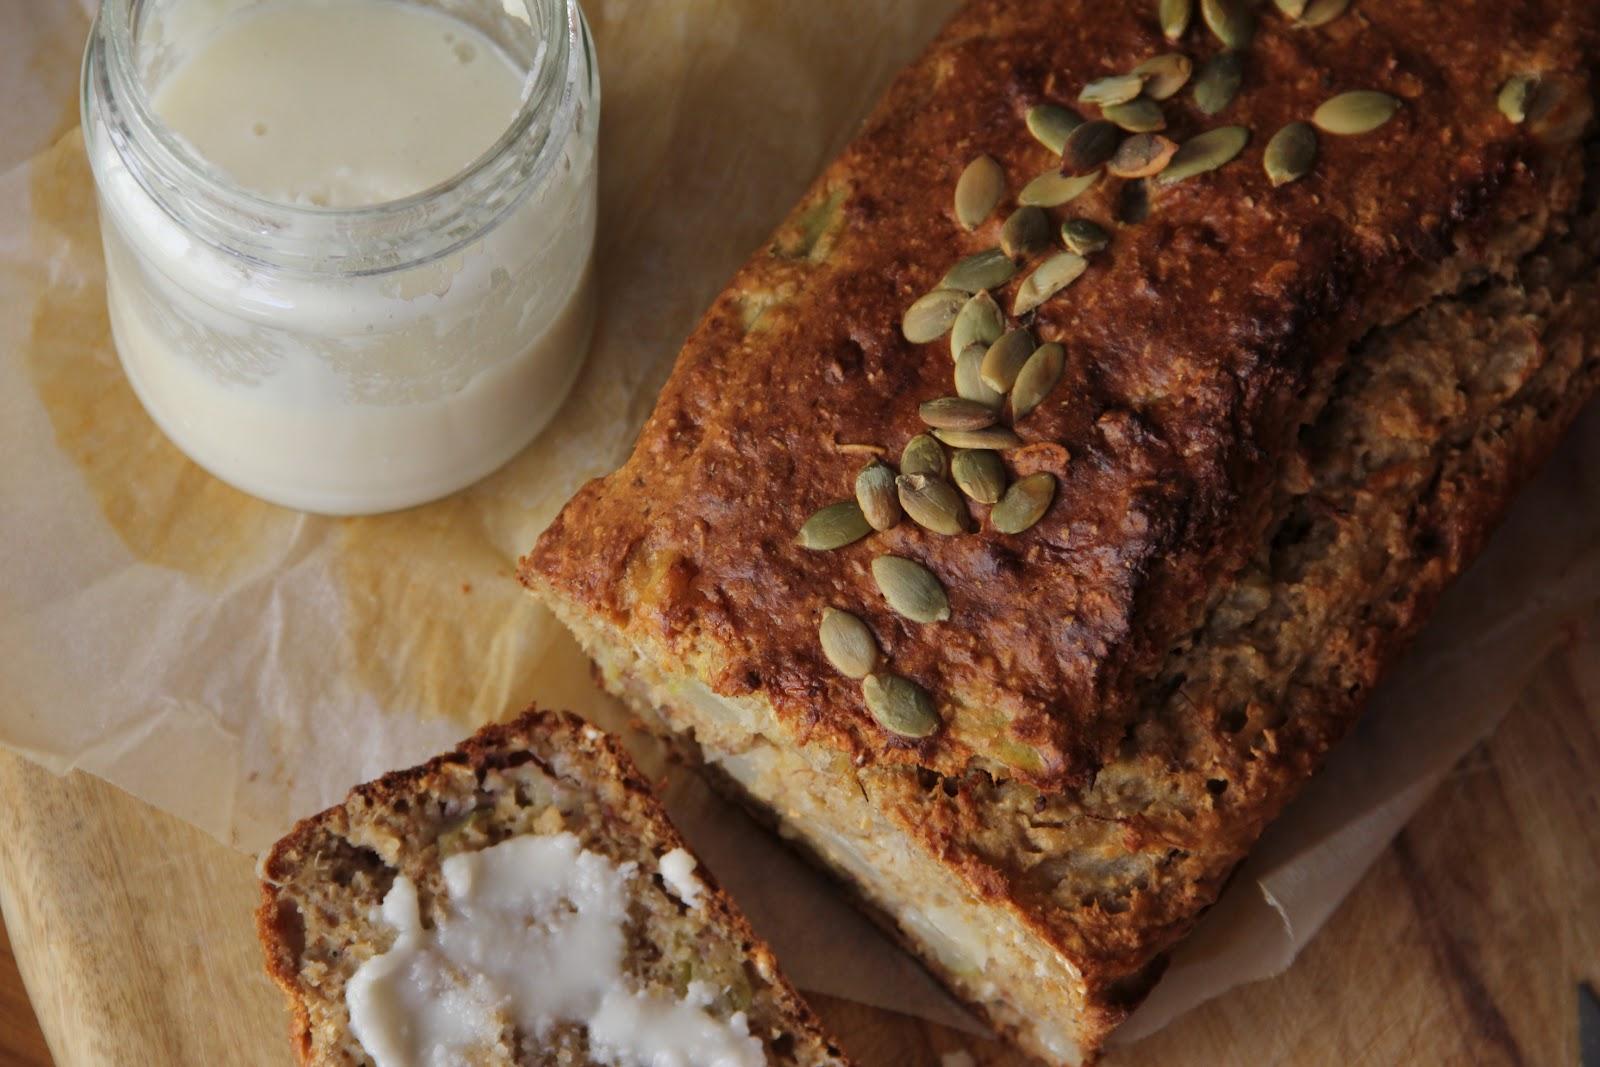 bona food: Wholemeal Pear & Banana Loaf